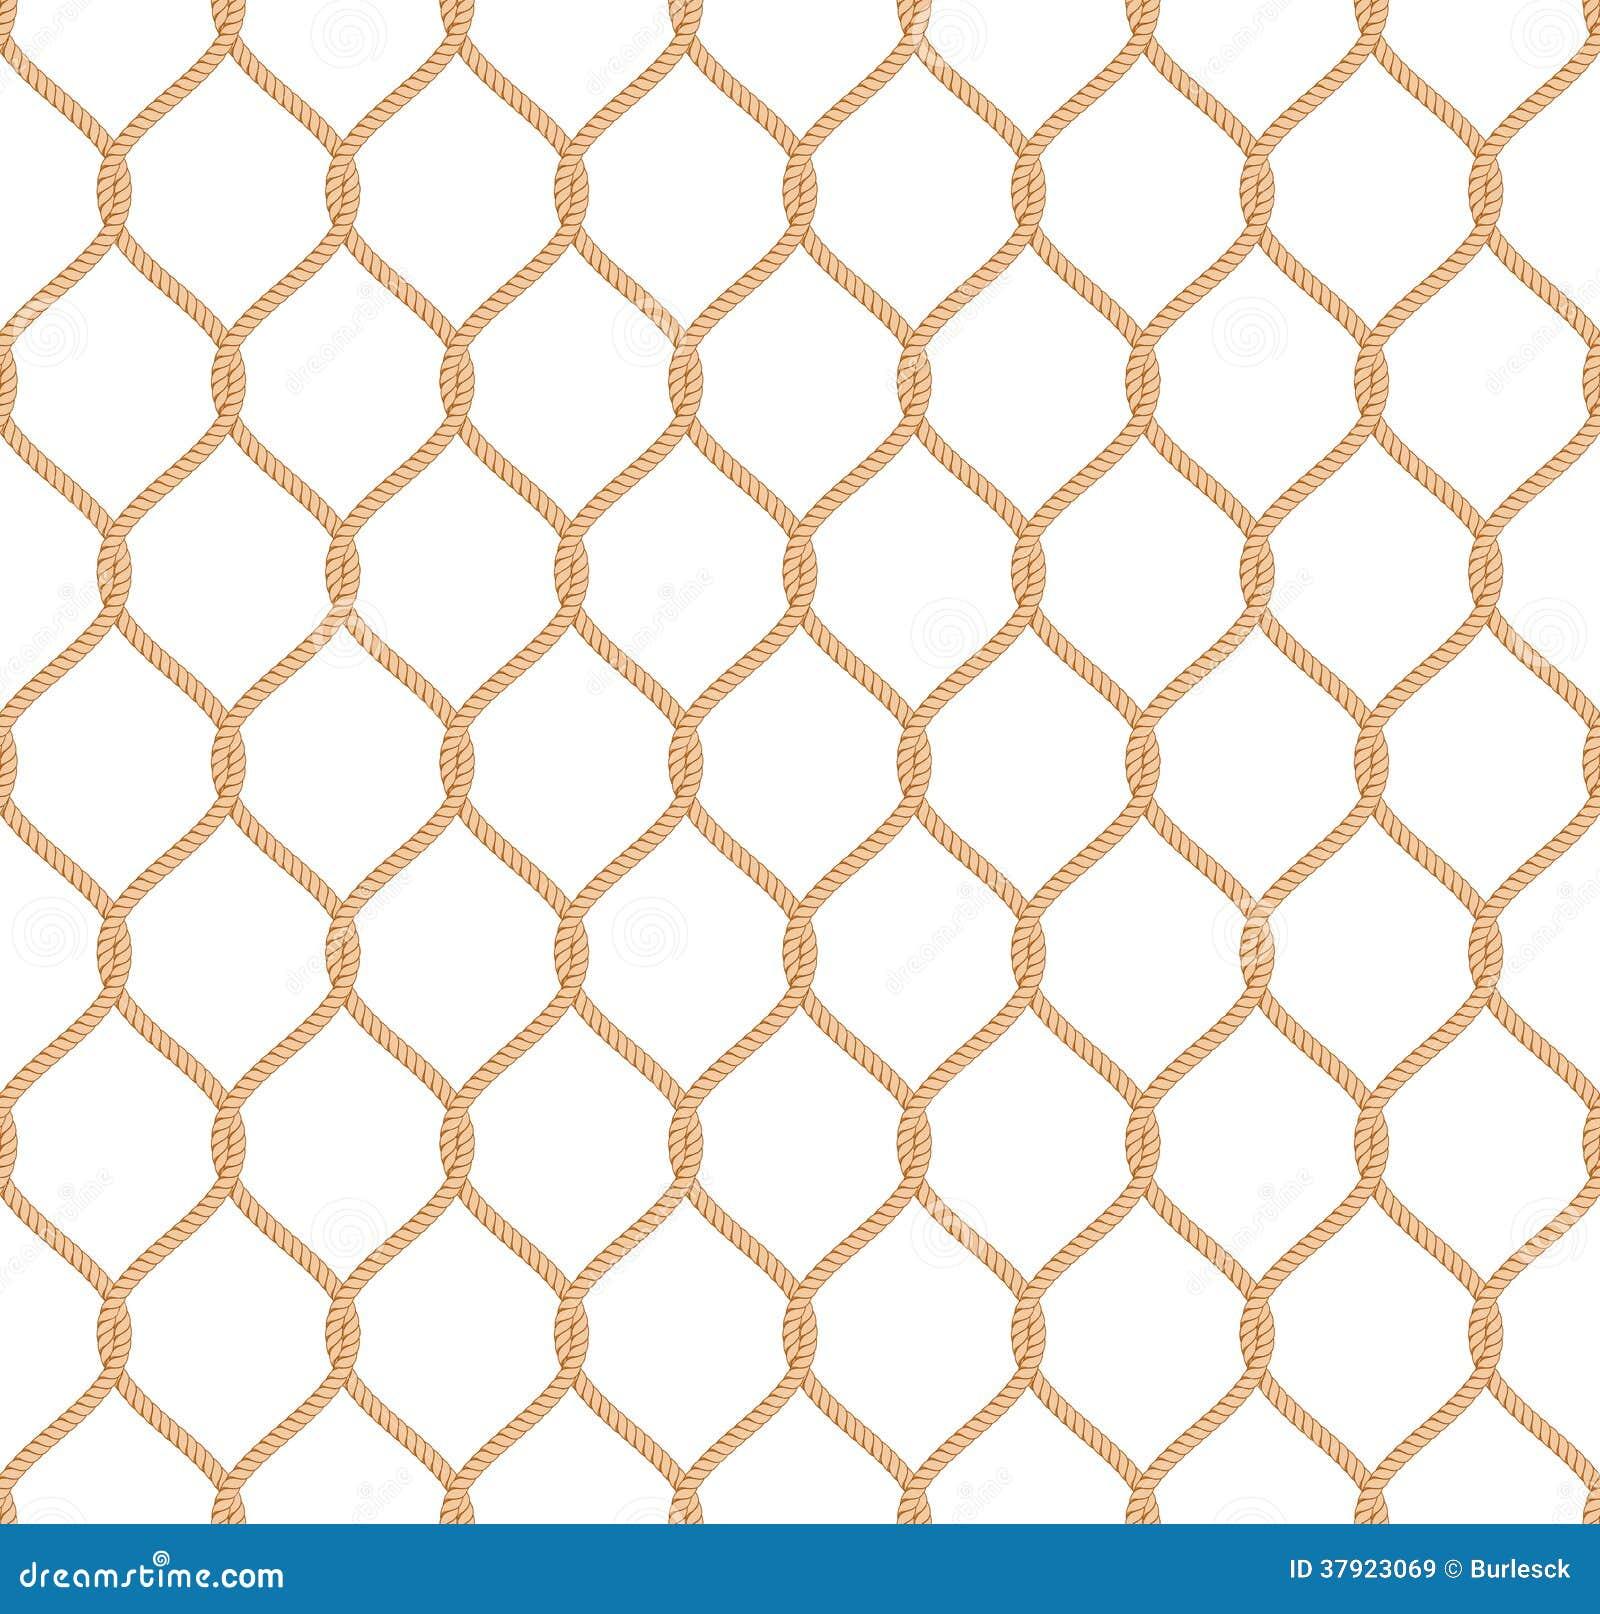 Rope Marine Net Pattern Royalty Free Stock Images - Image ...